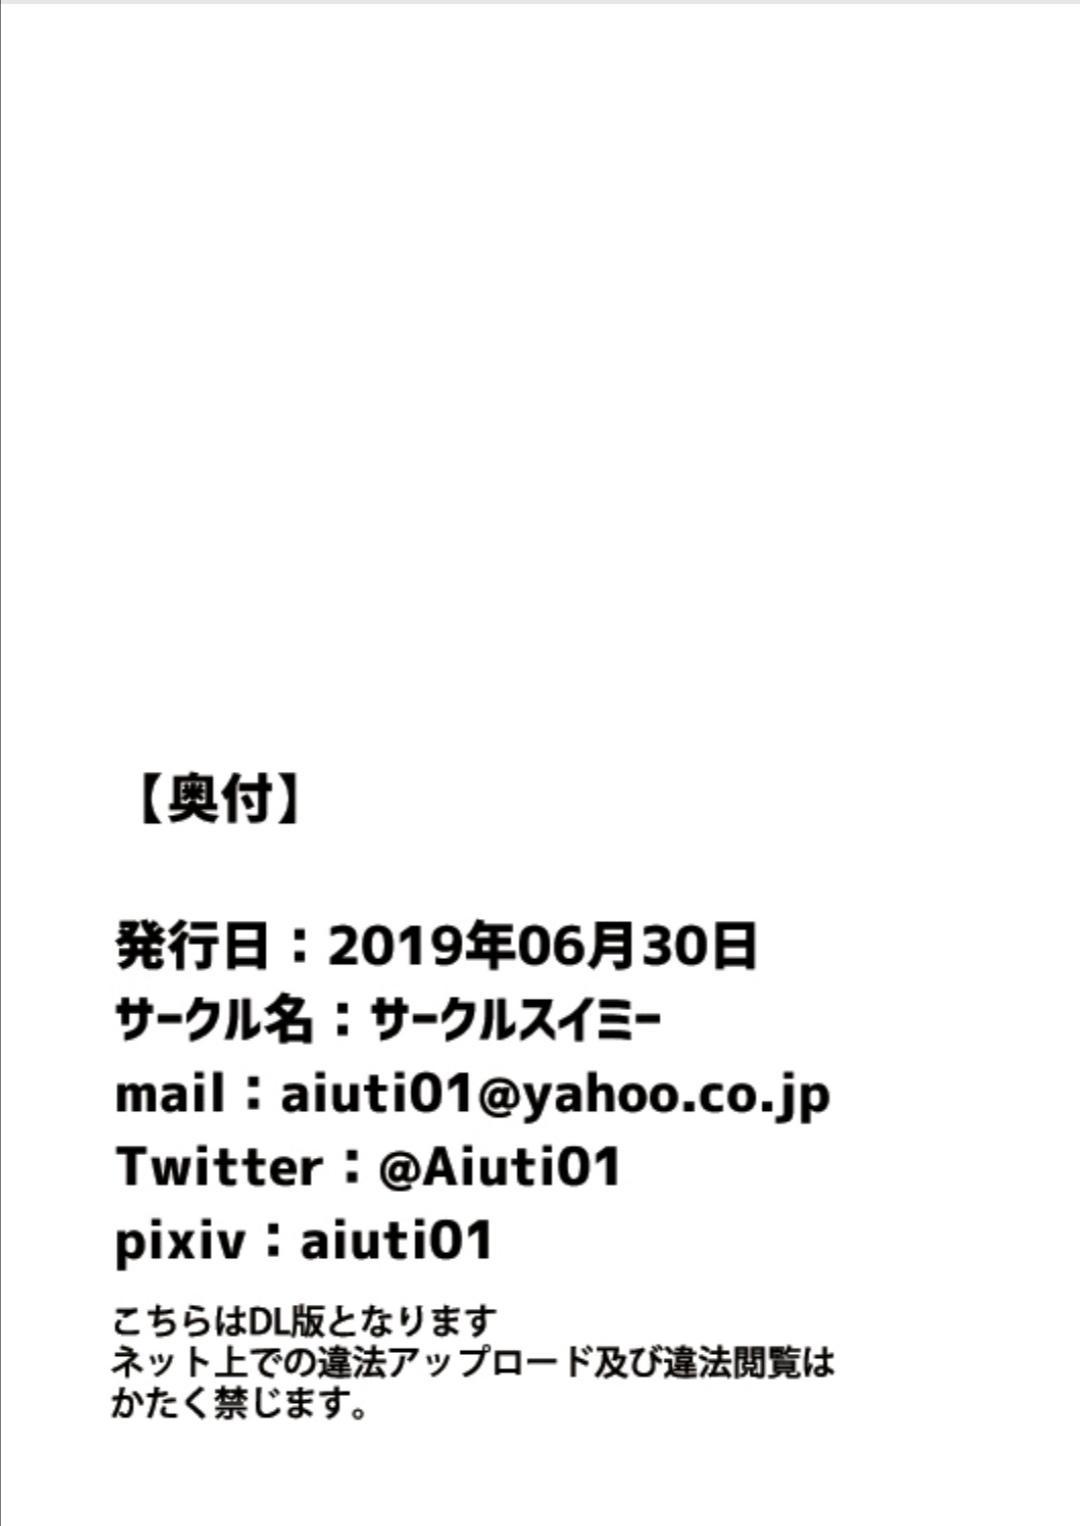 Hoshi 5 Hand Gun ga Sex Skin o Kiserarete Love Doll Mission o Shiirrareru Hon 19